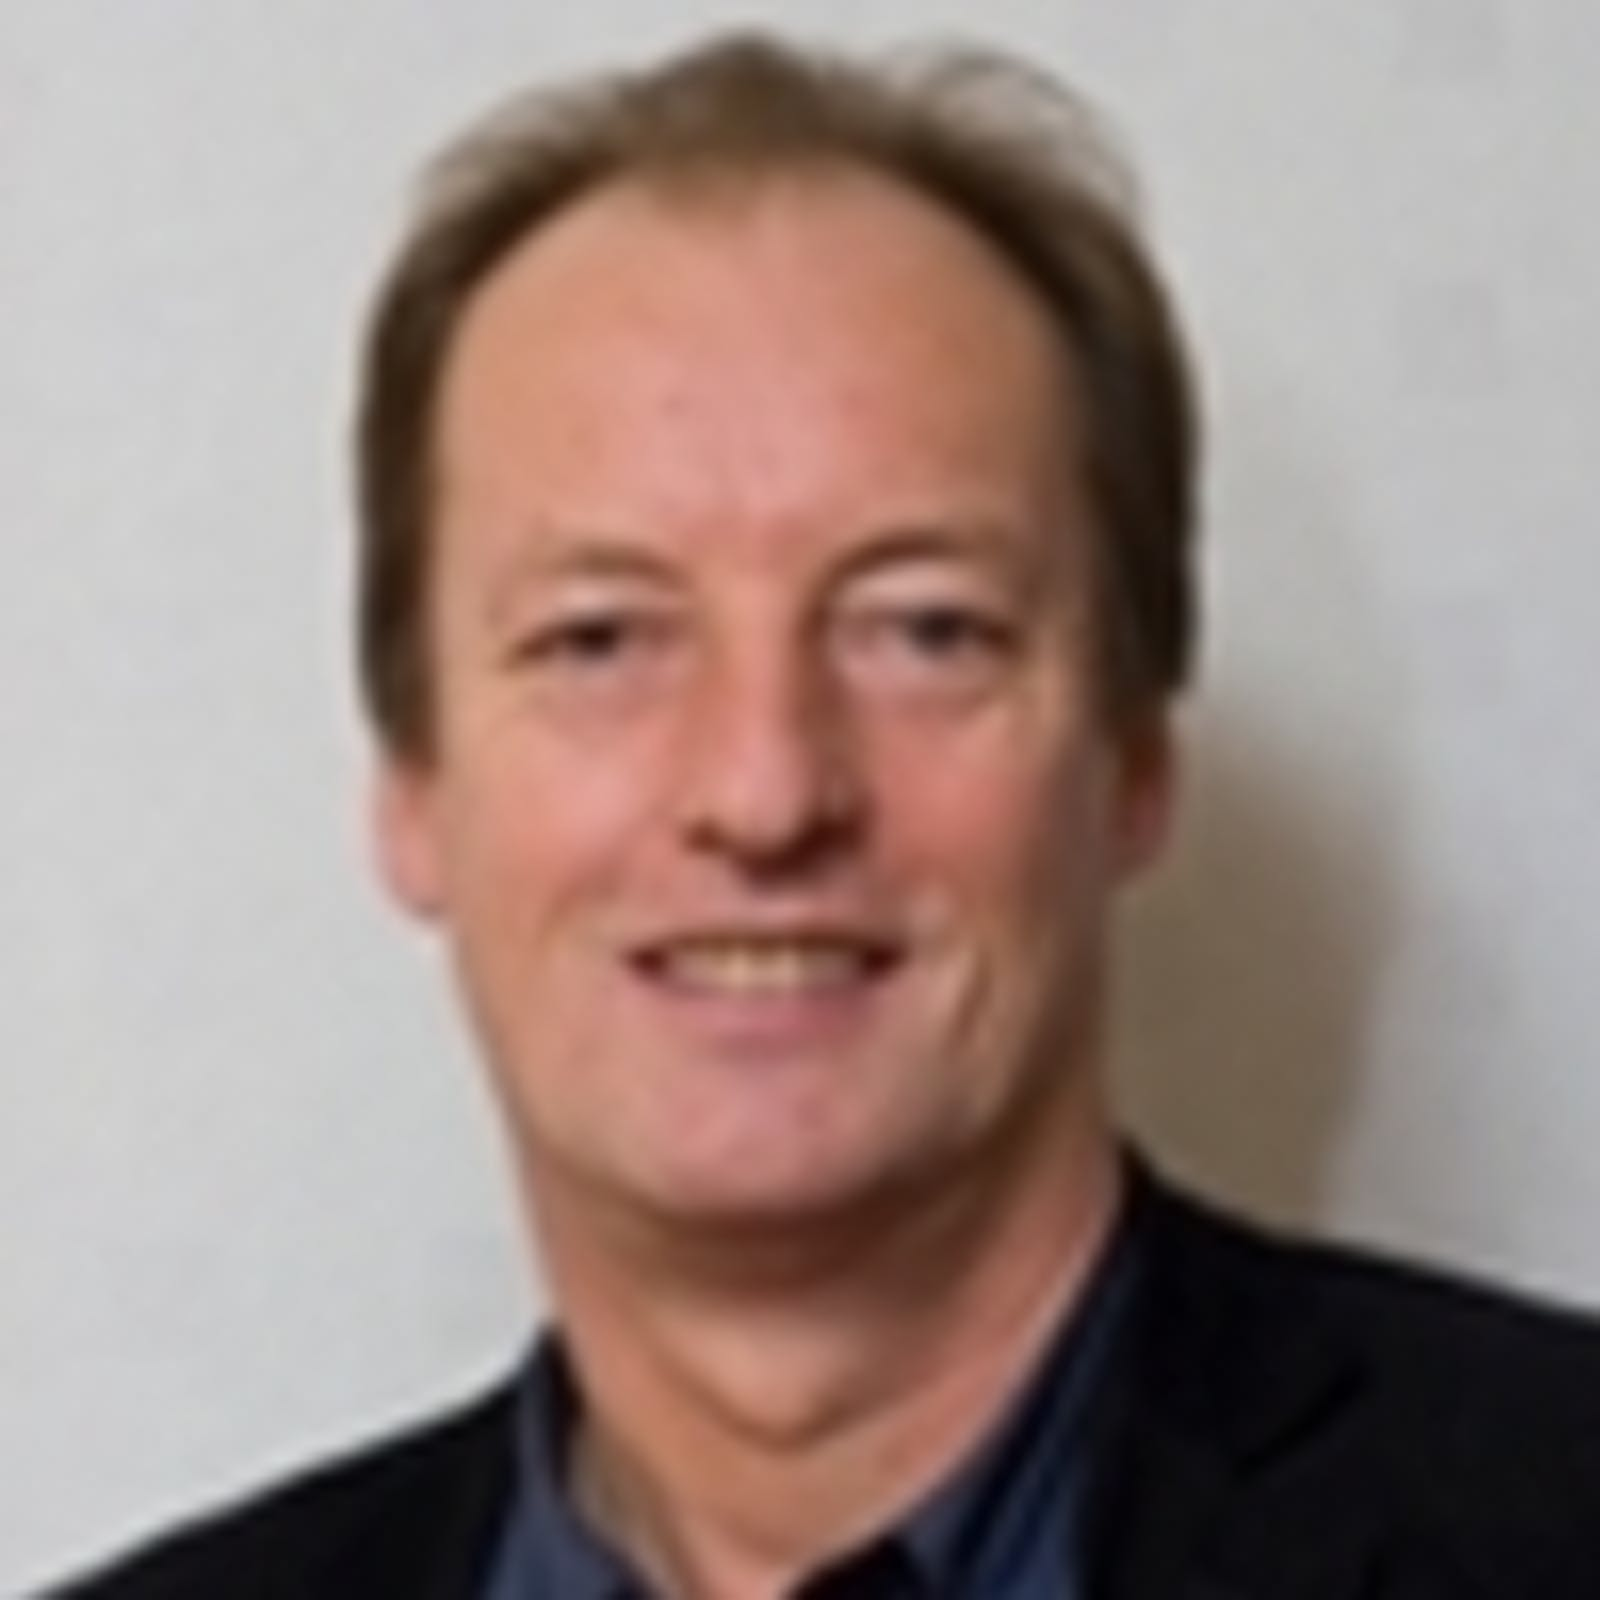 Peter Buckingham